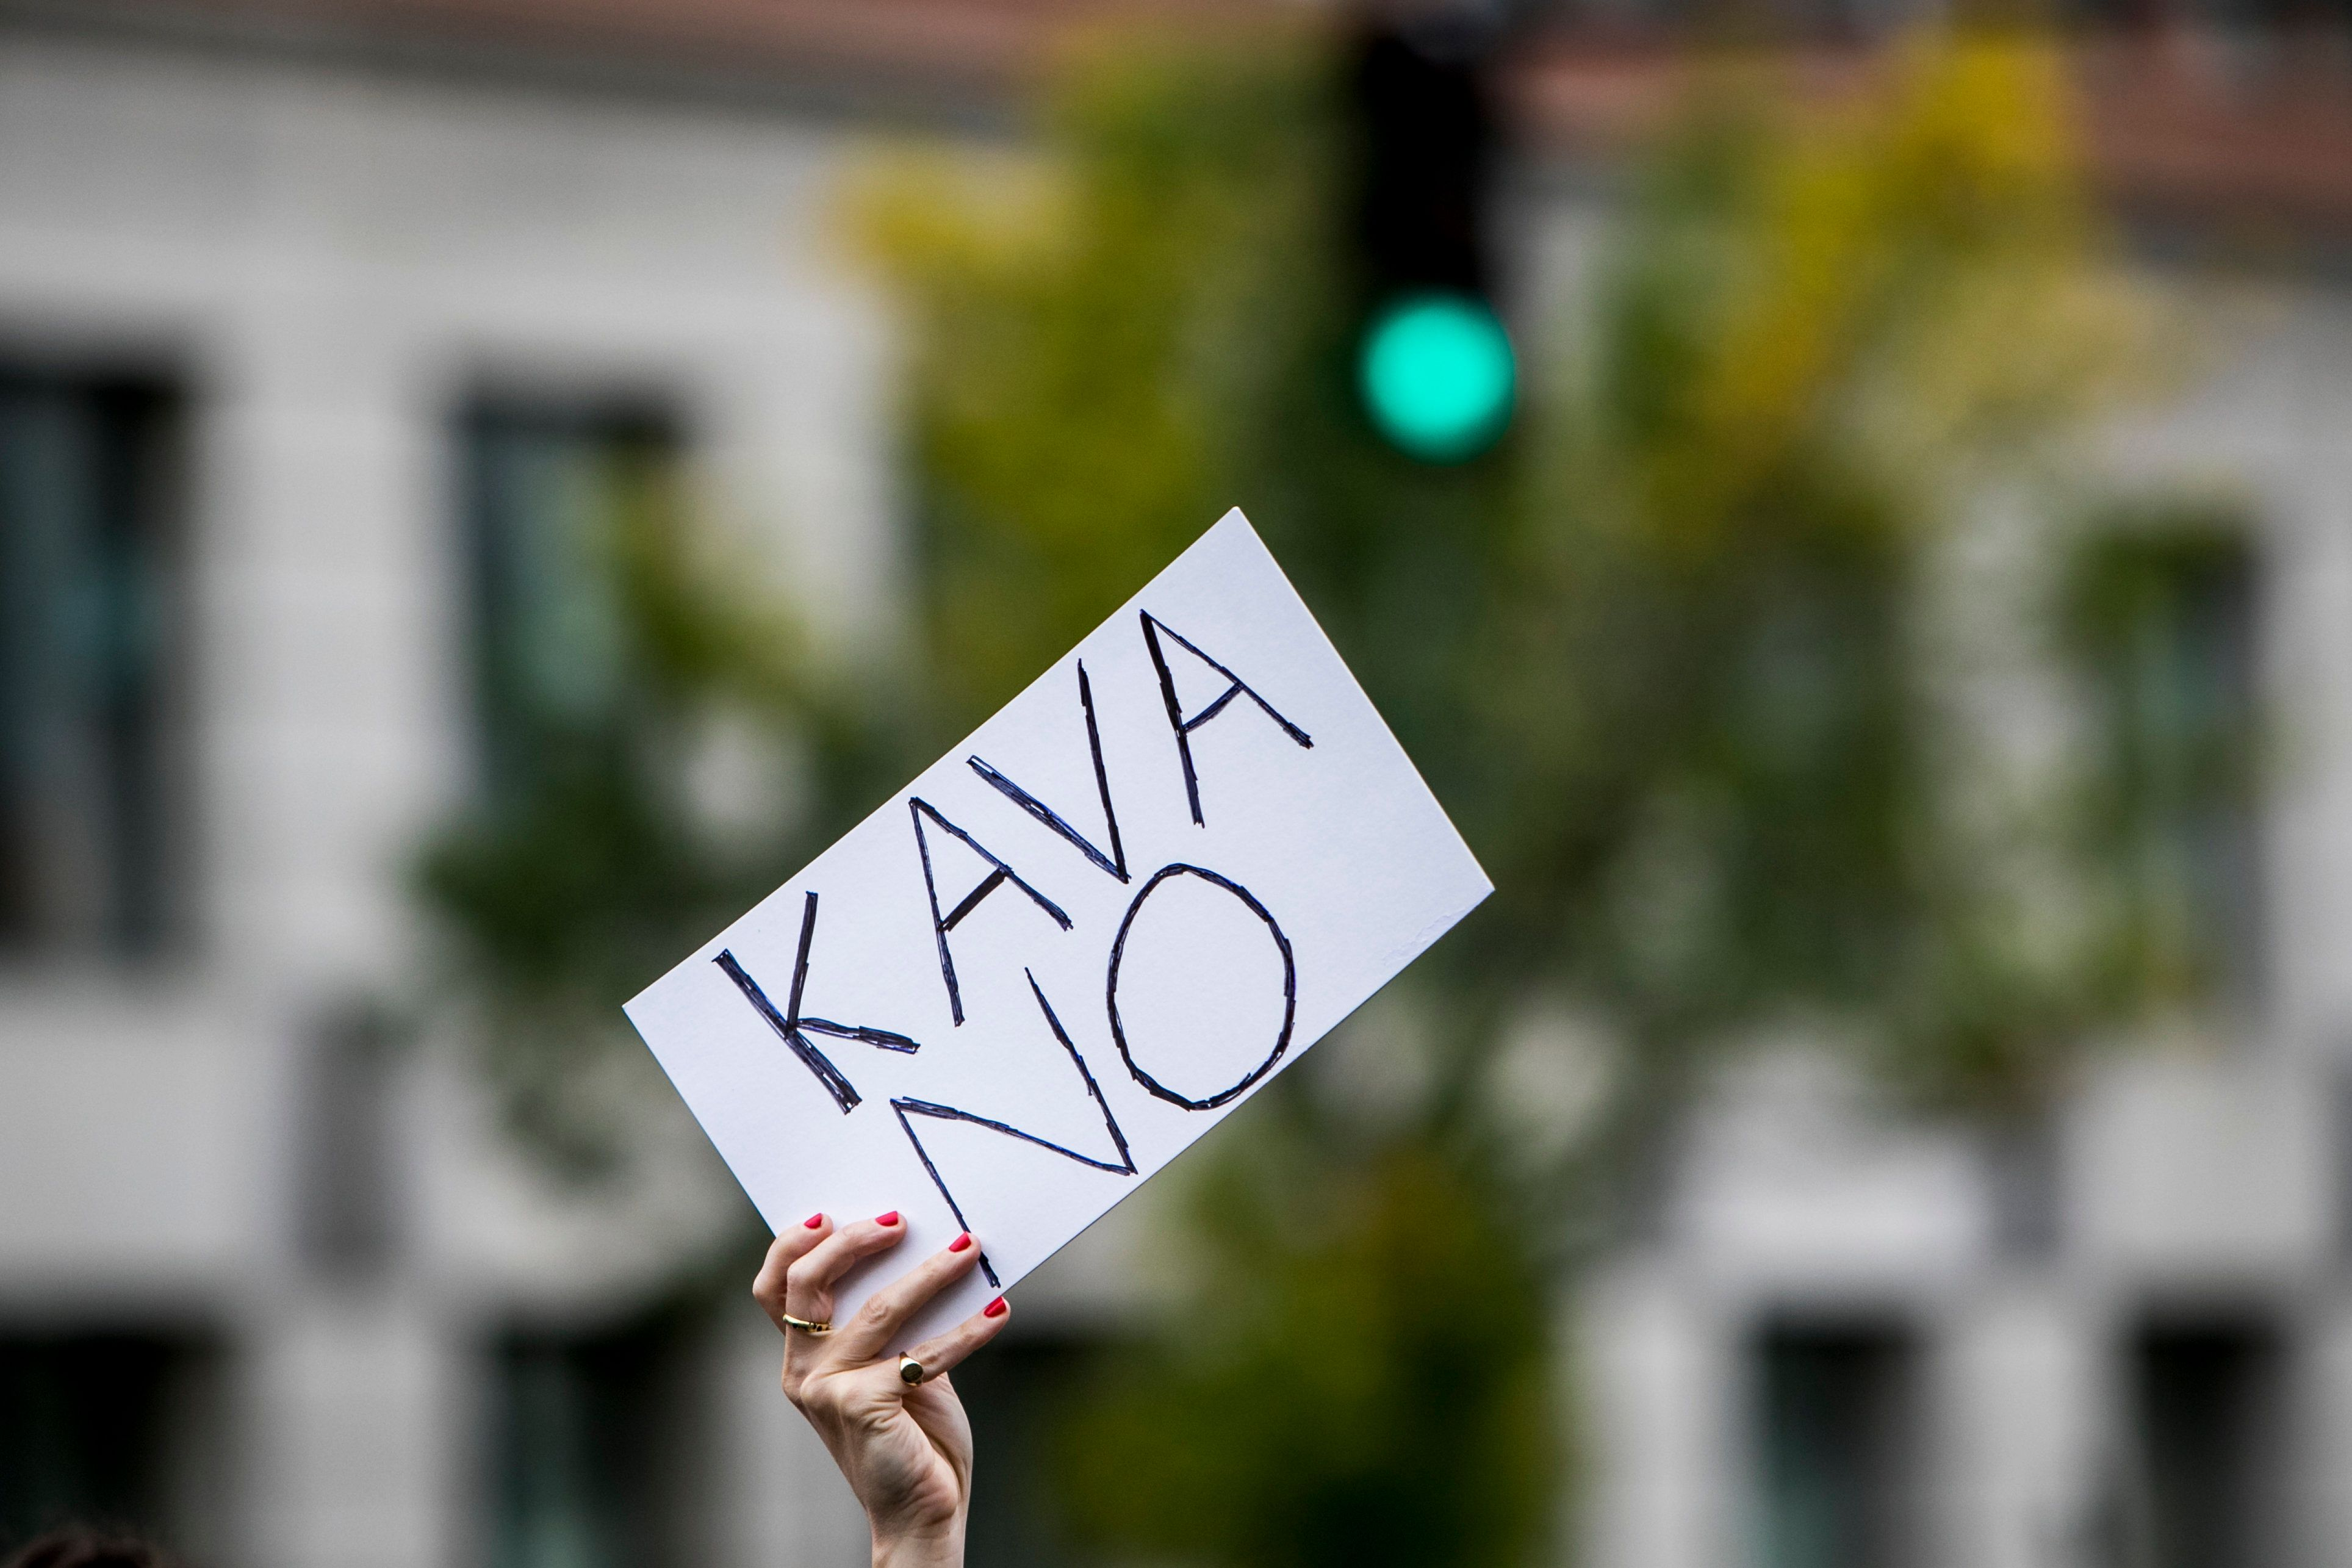 Senate confirms Brett Kavanaugh to US Supreme Court